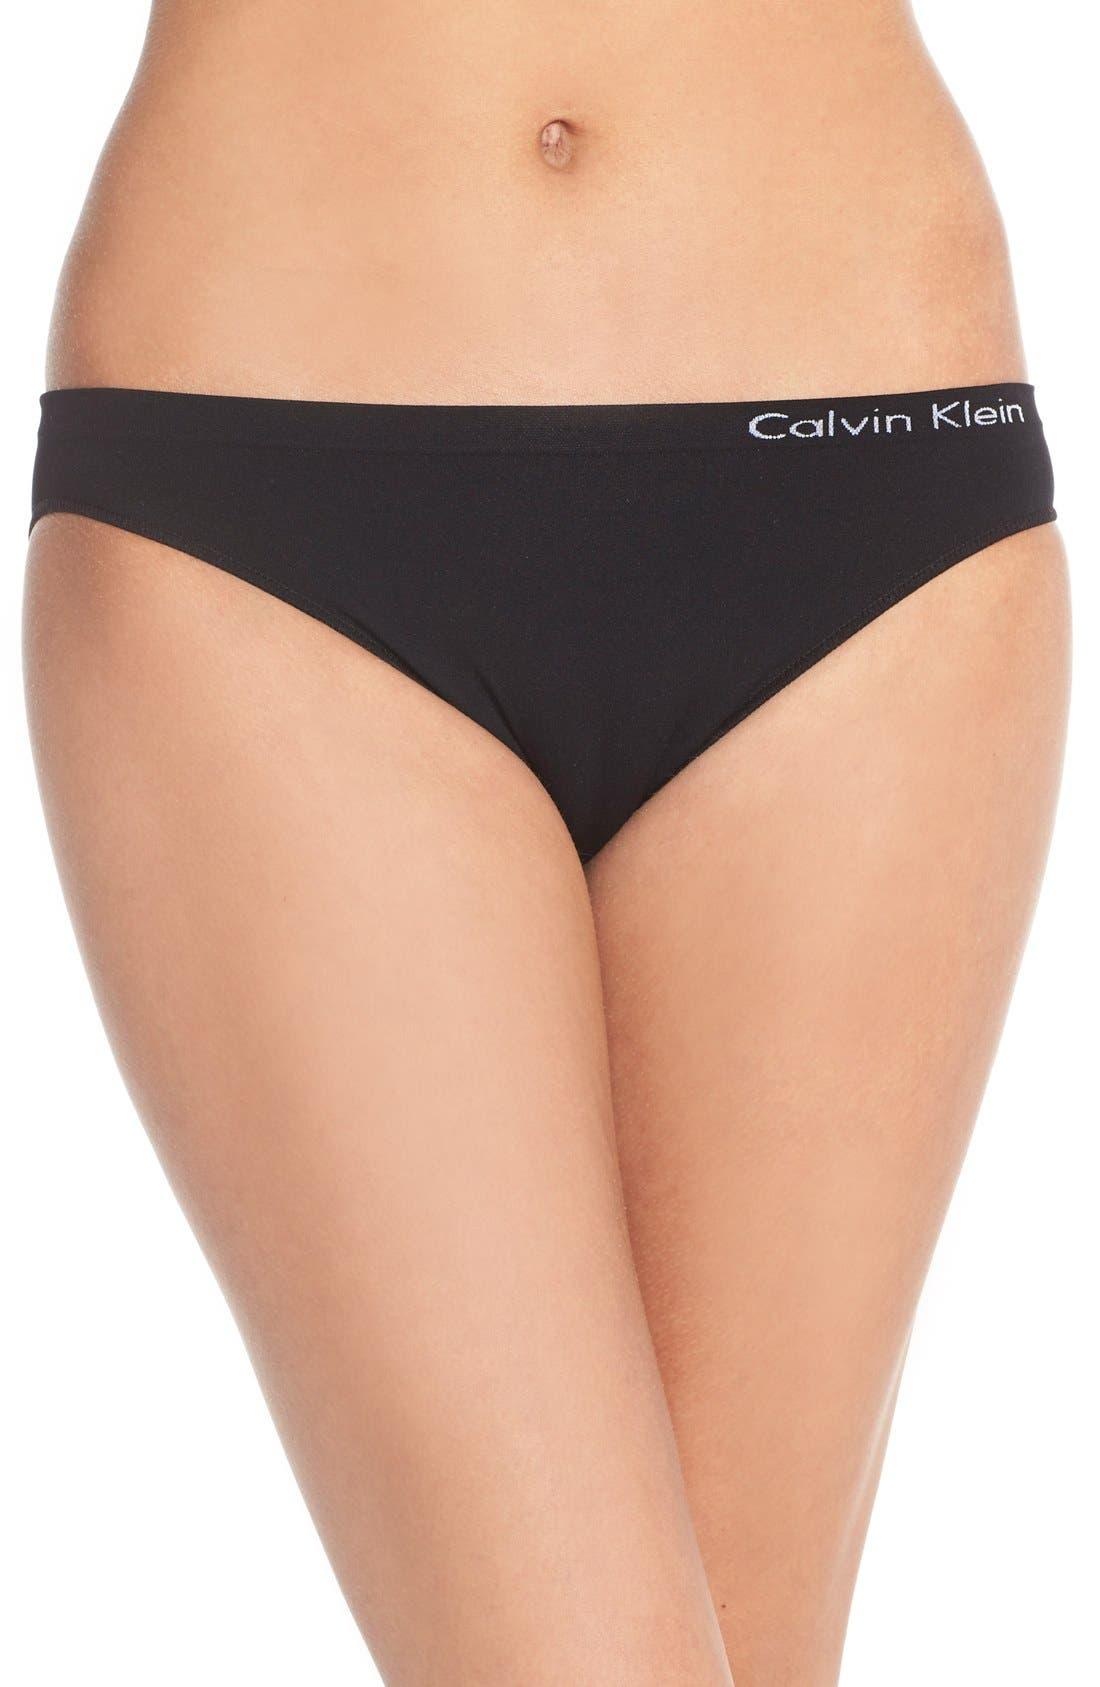 CALVIN KLEIN 'Pure' Seamless Bikini, Main, color, BLACK